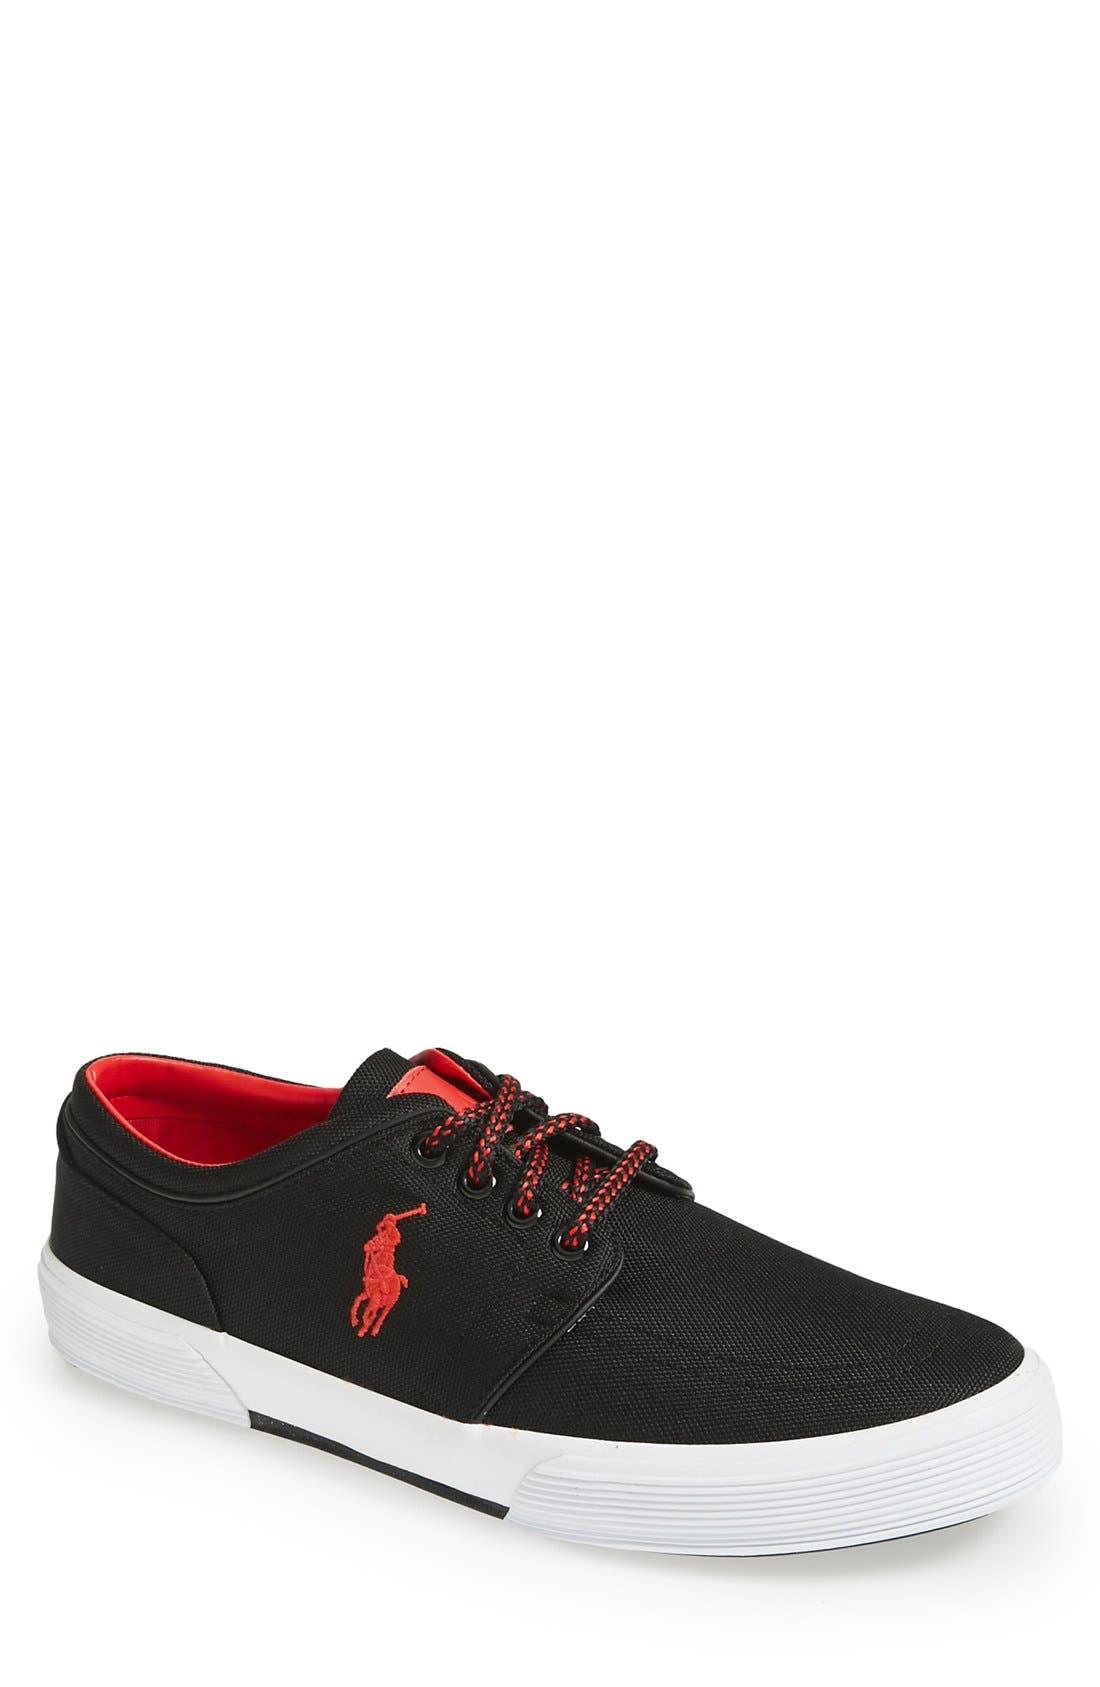 'Faxon Low' Sneaker,                             Main thumbnail 1, color,                             001